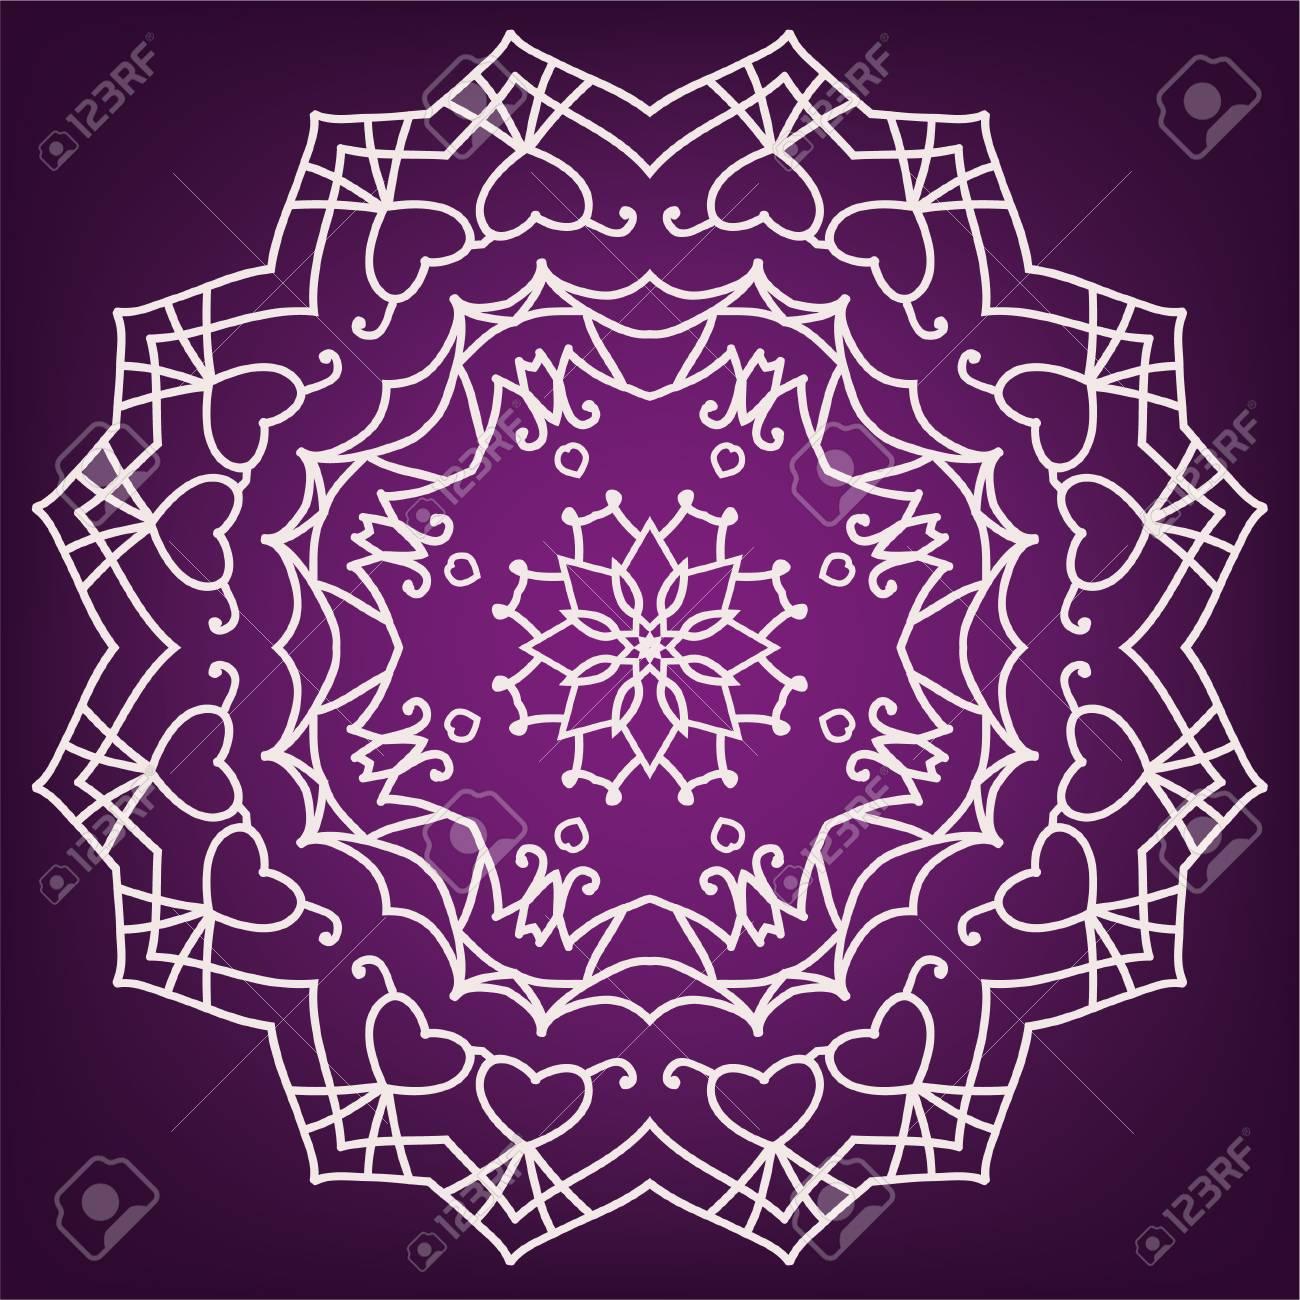 Mandala Of Love On A Purple Background Ethnic Patterns Greetings